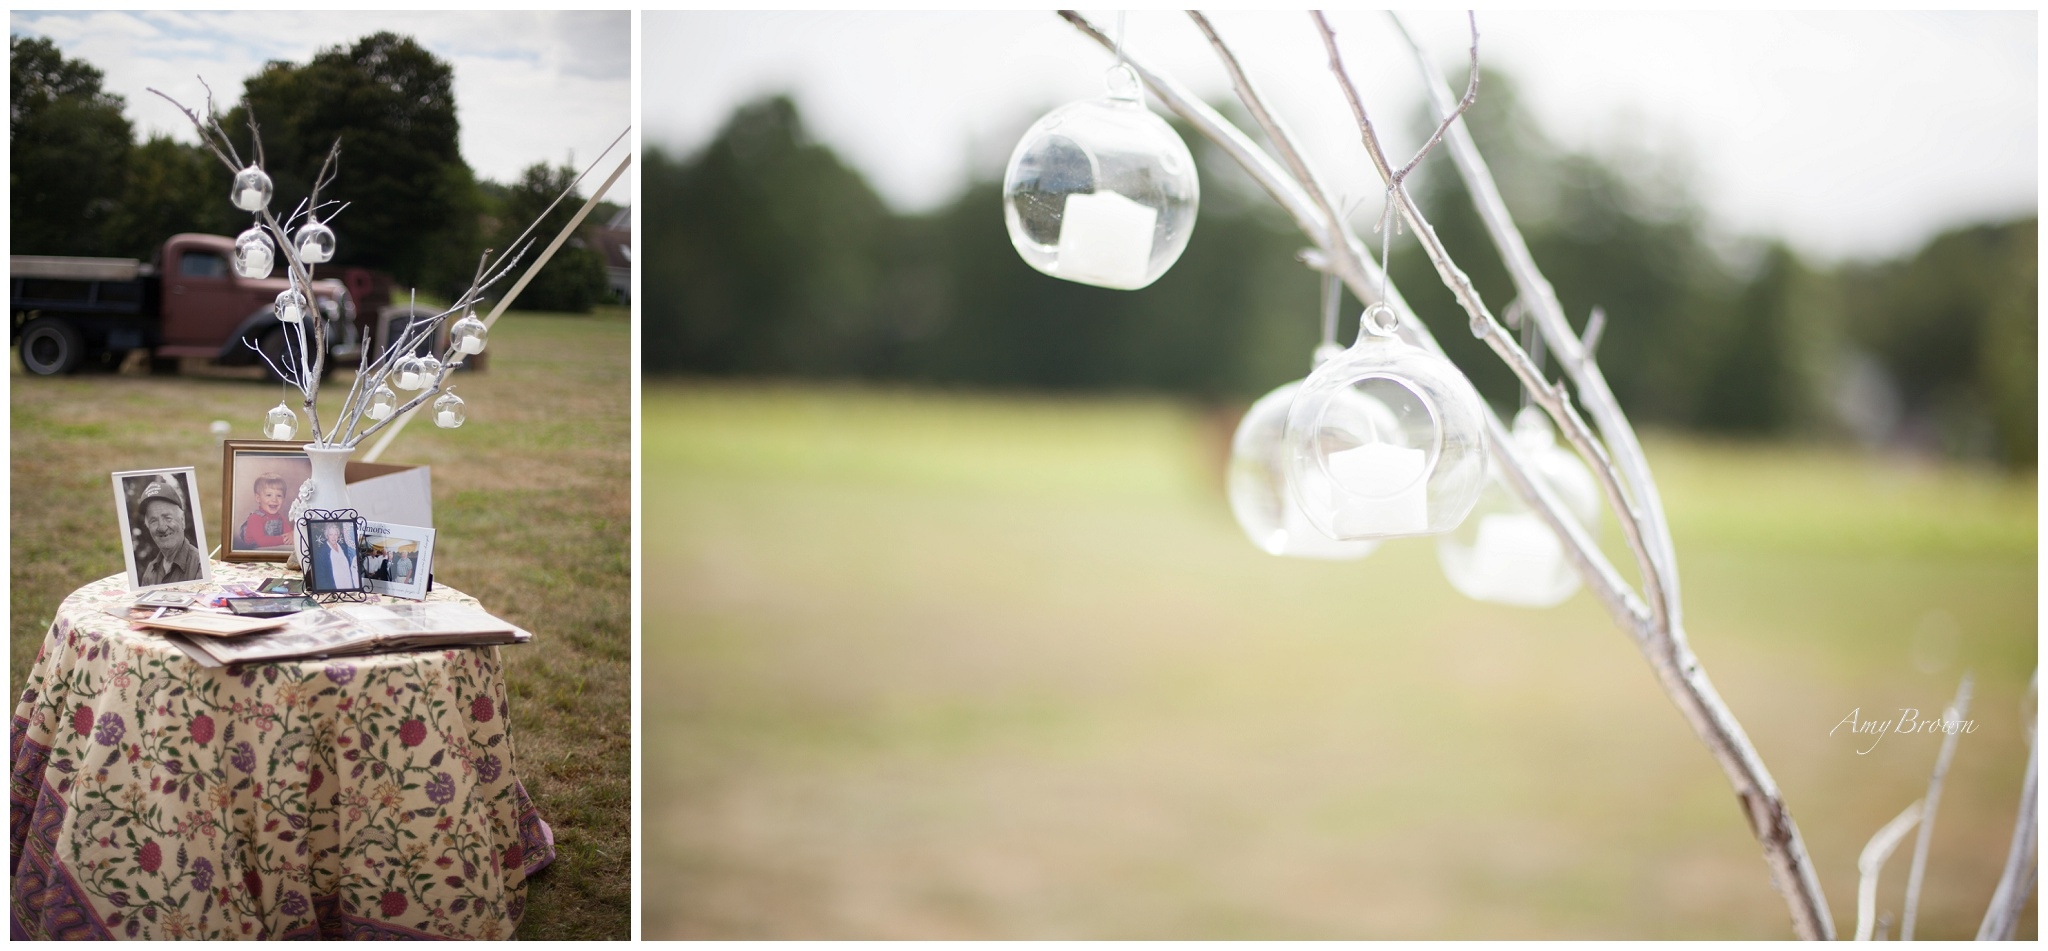 Southern NH Wedding Photographer | DIY wedding decor | Amy Brown Photography